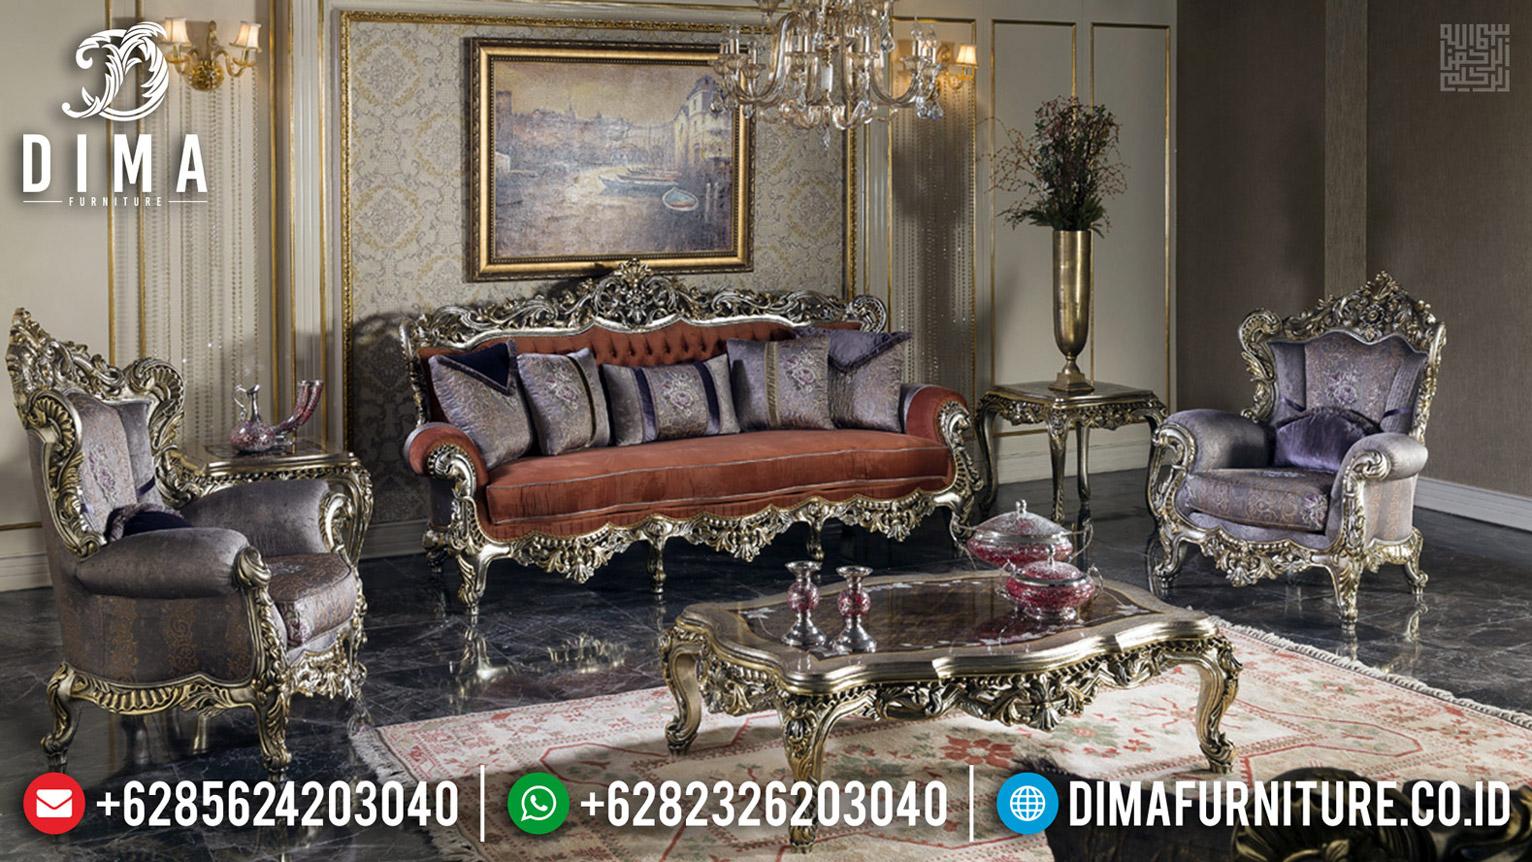 Furniture Jepara Sofa Tamu Mewah Luxury Classic New Design Get Sale MMJ-0597